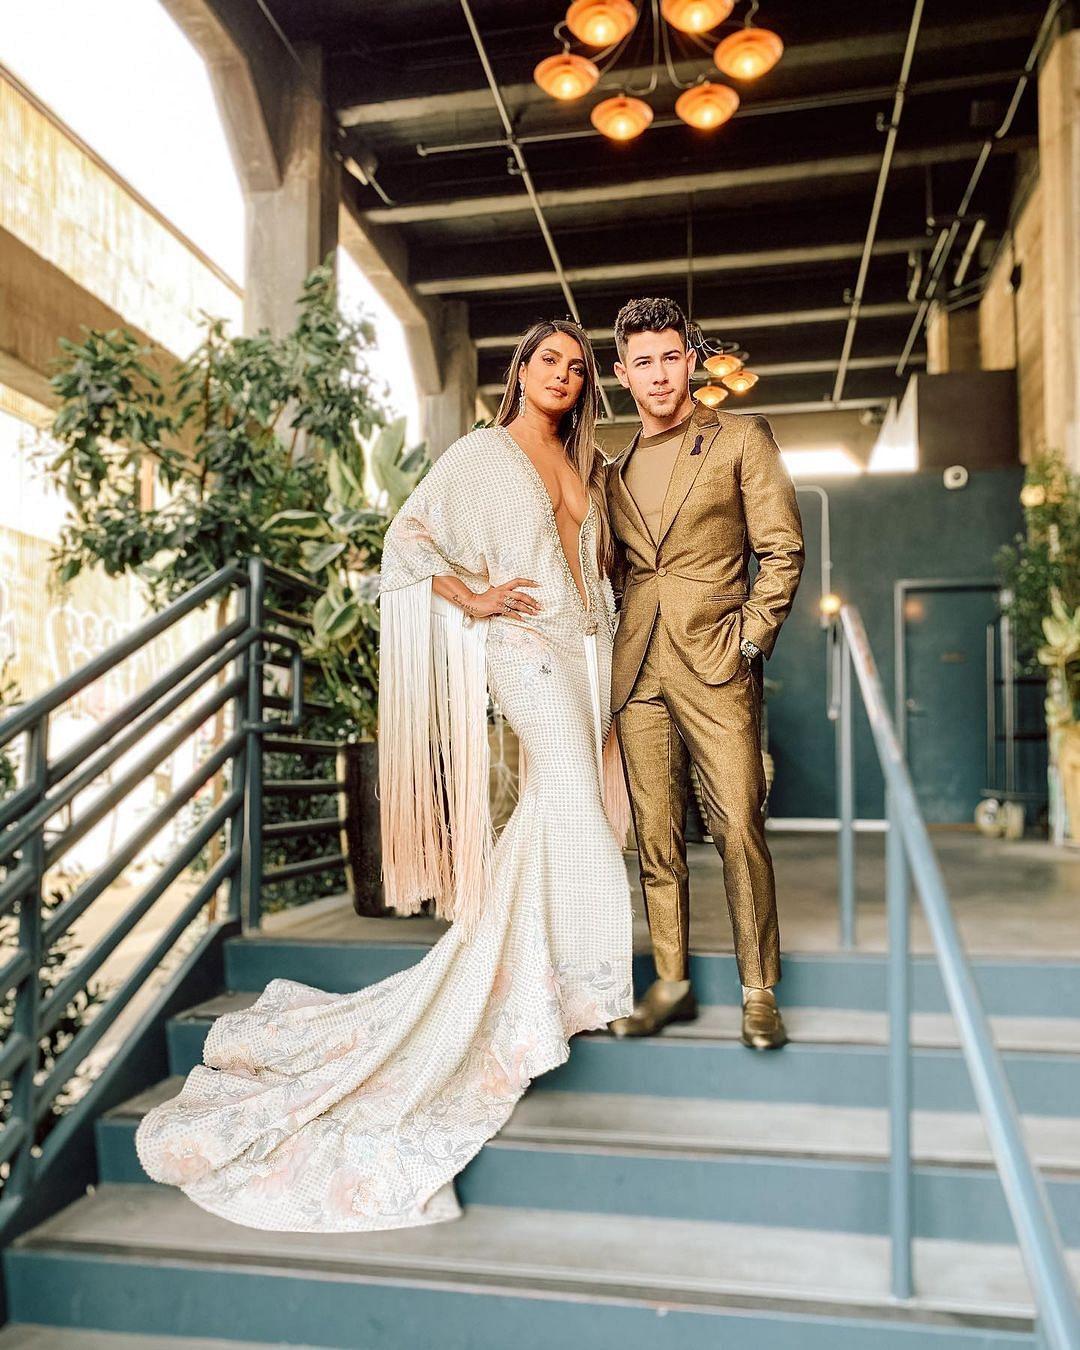 Priyanka Chopra Birthday Special: Cutest moments with hubby Nick Jonas